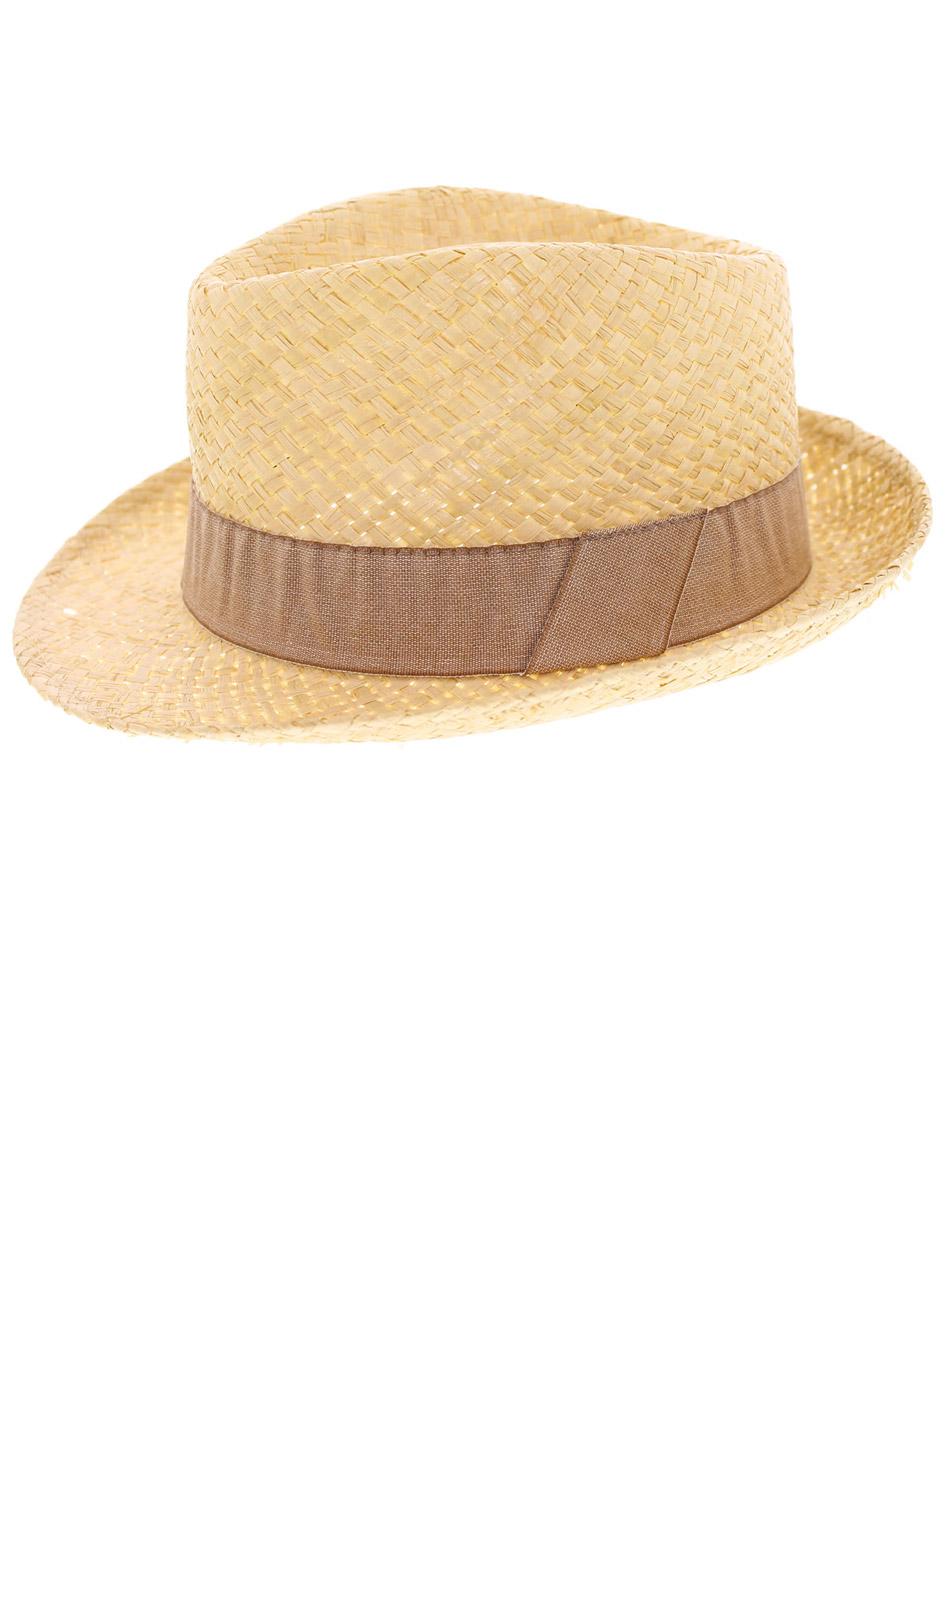 1a7ff078f26 Slameny prirodni klobouk - Cochces.cz